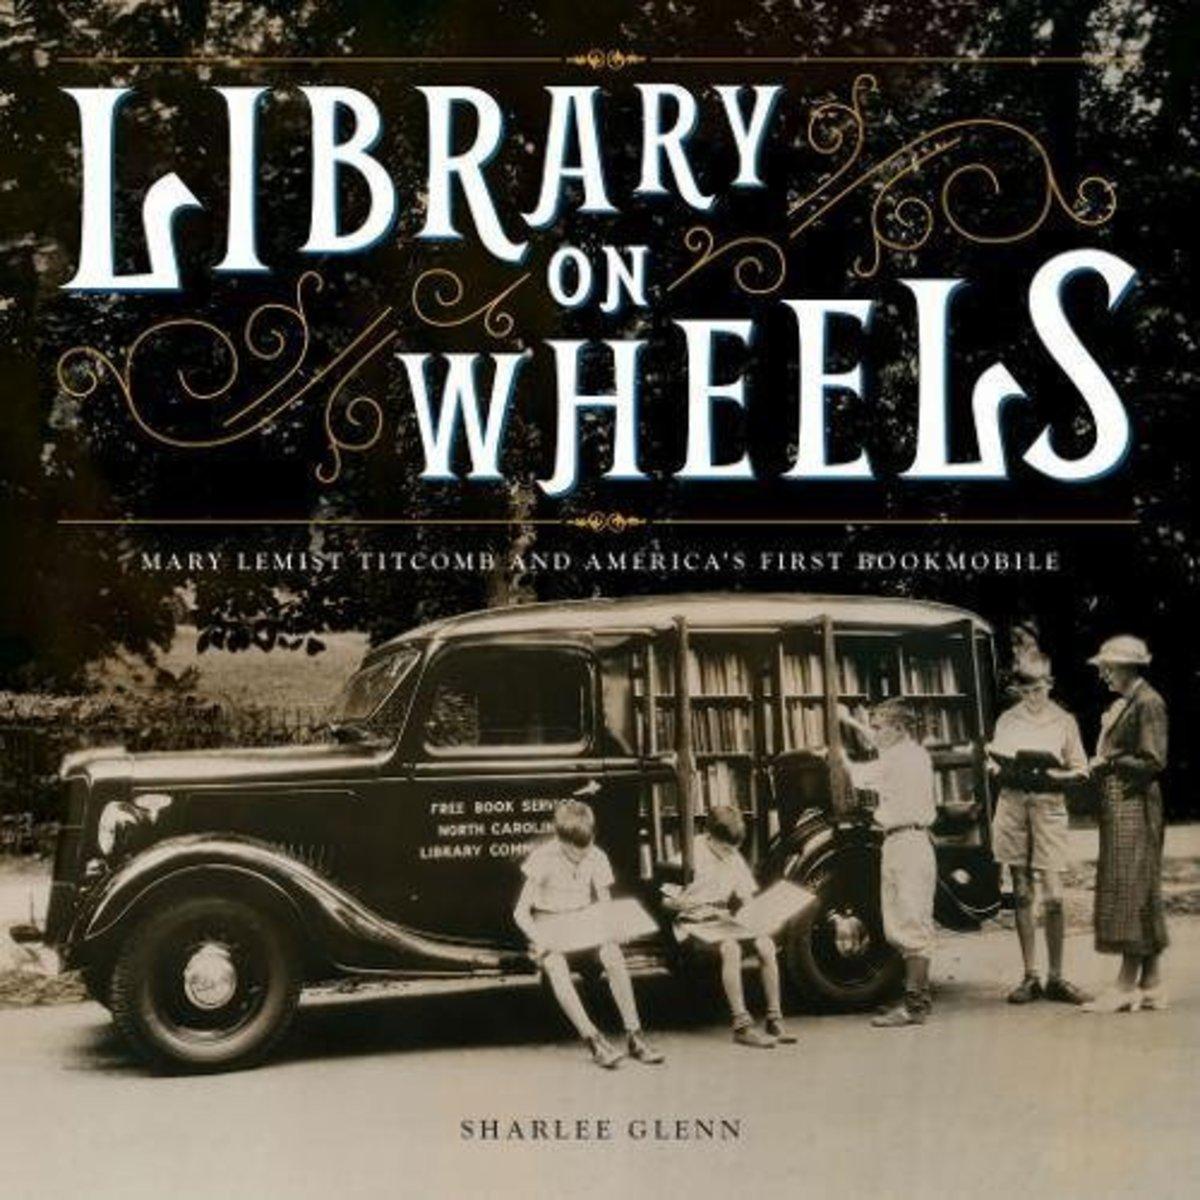 Library on Wheels by Sharlee Glenn